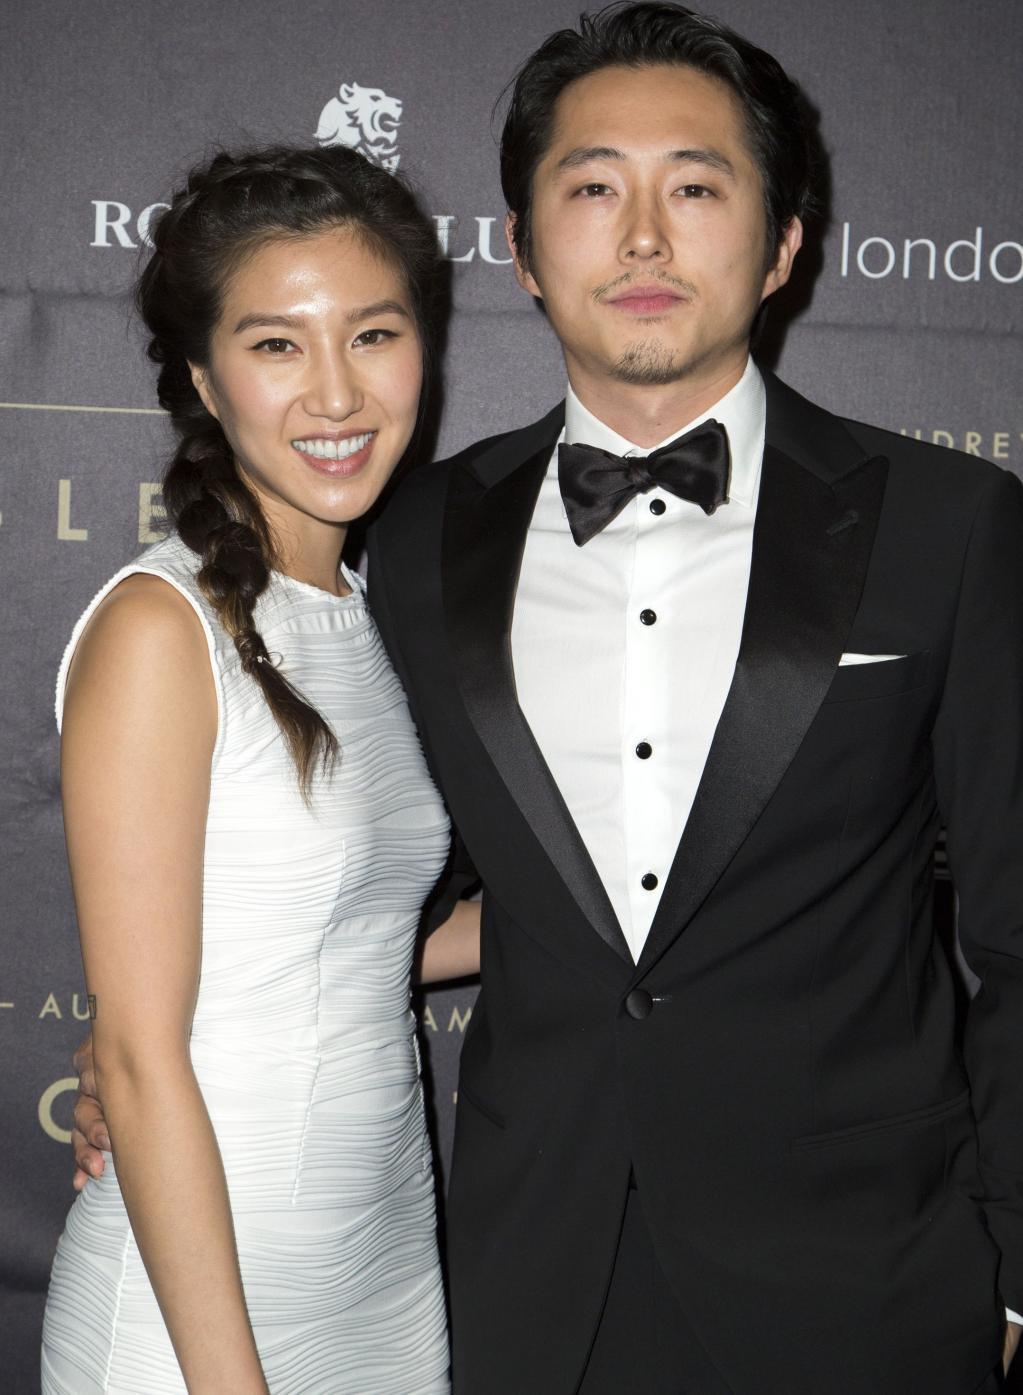 The Walking Dead Alum    Steven Yeun and Wife Joana Pak Share First Photo of Newborn Son